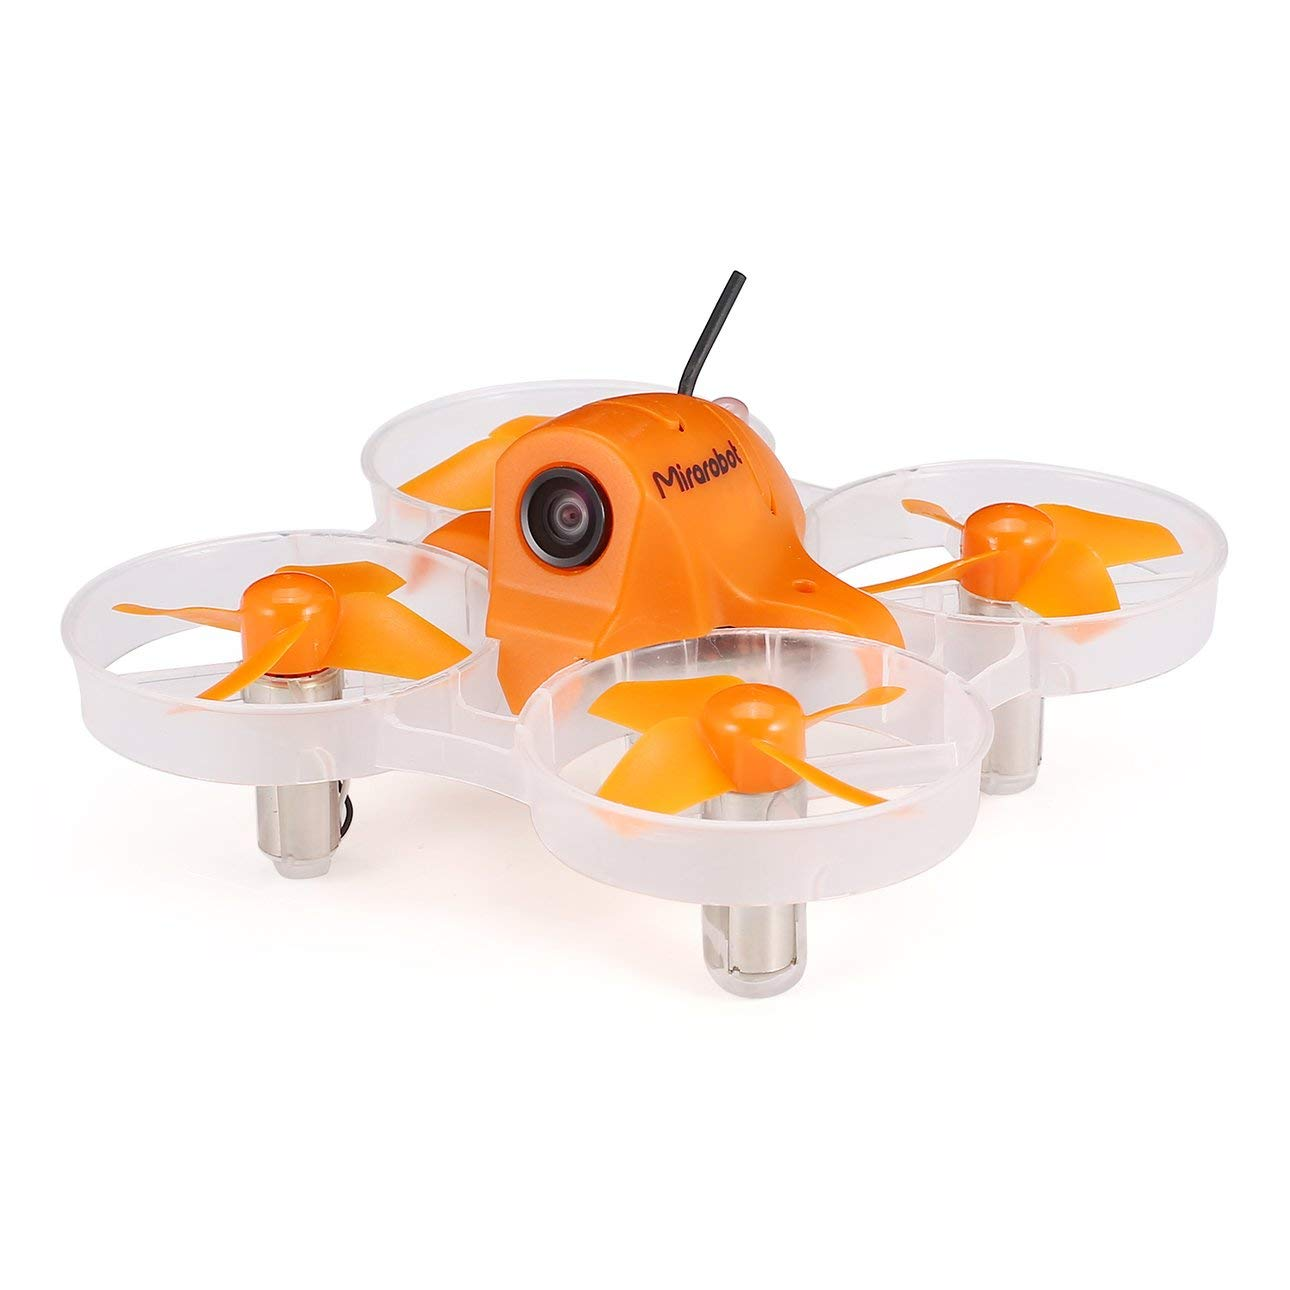 Drohne Mirobrobot S85 5,8 G 25 mW 600TVL Kamera Tiny Micro Indoor FPV RC Renndrohne von Ballylyly